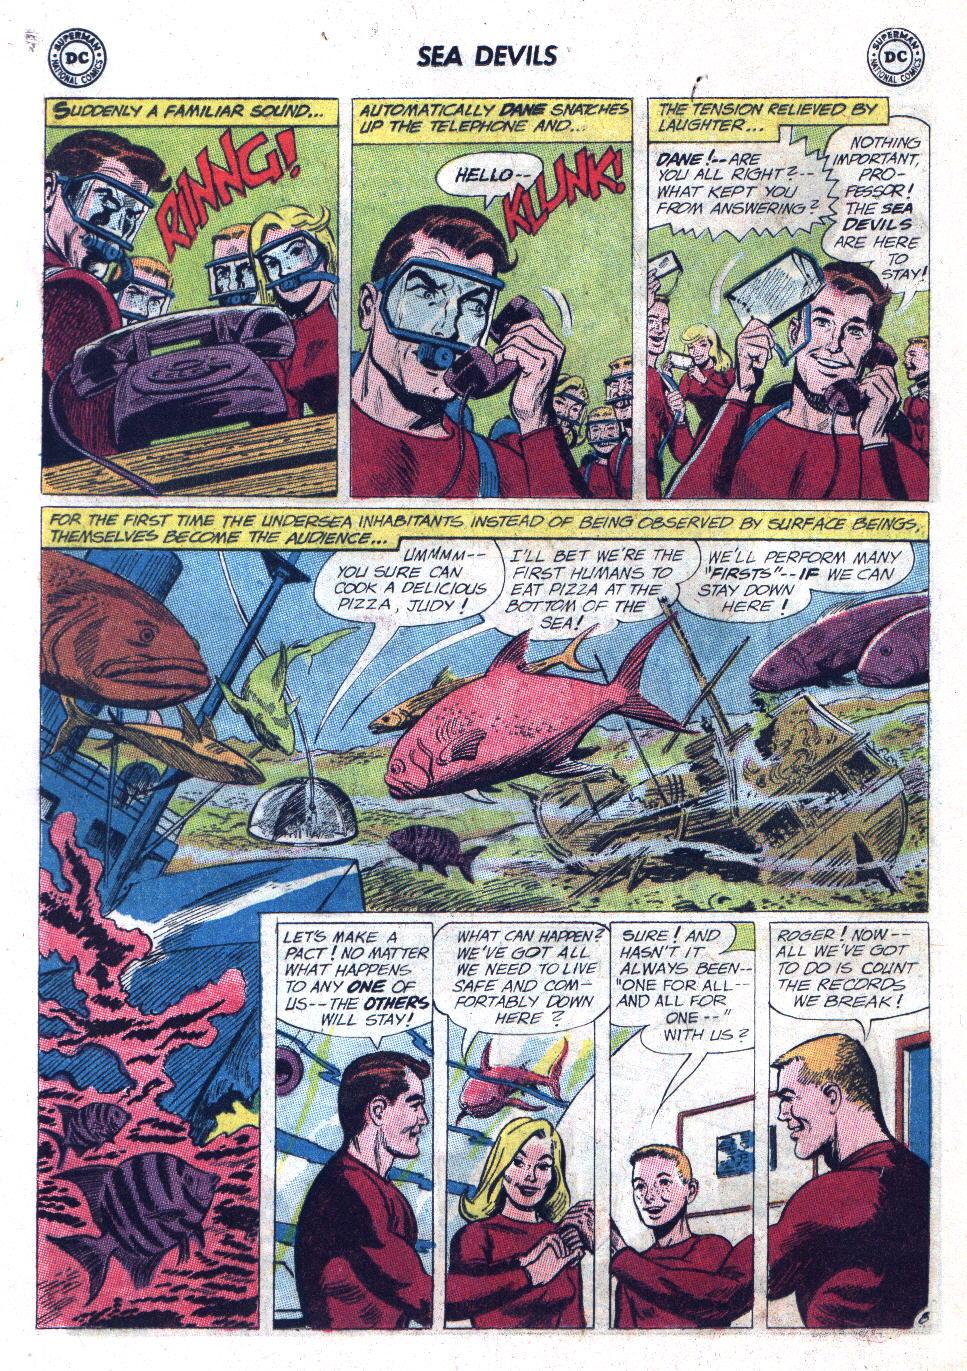 Read online Sea Devils comic -  Issue #11 - 12